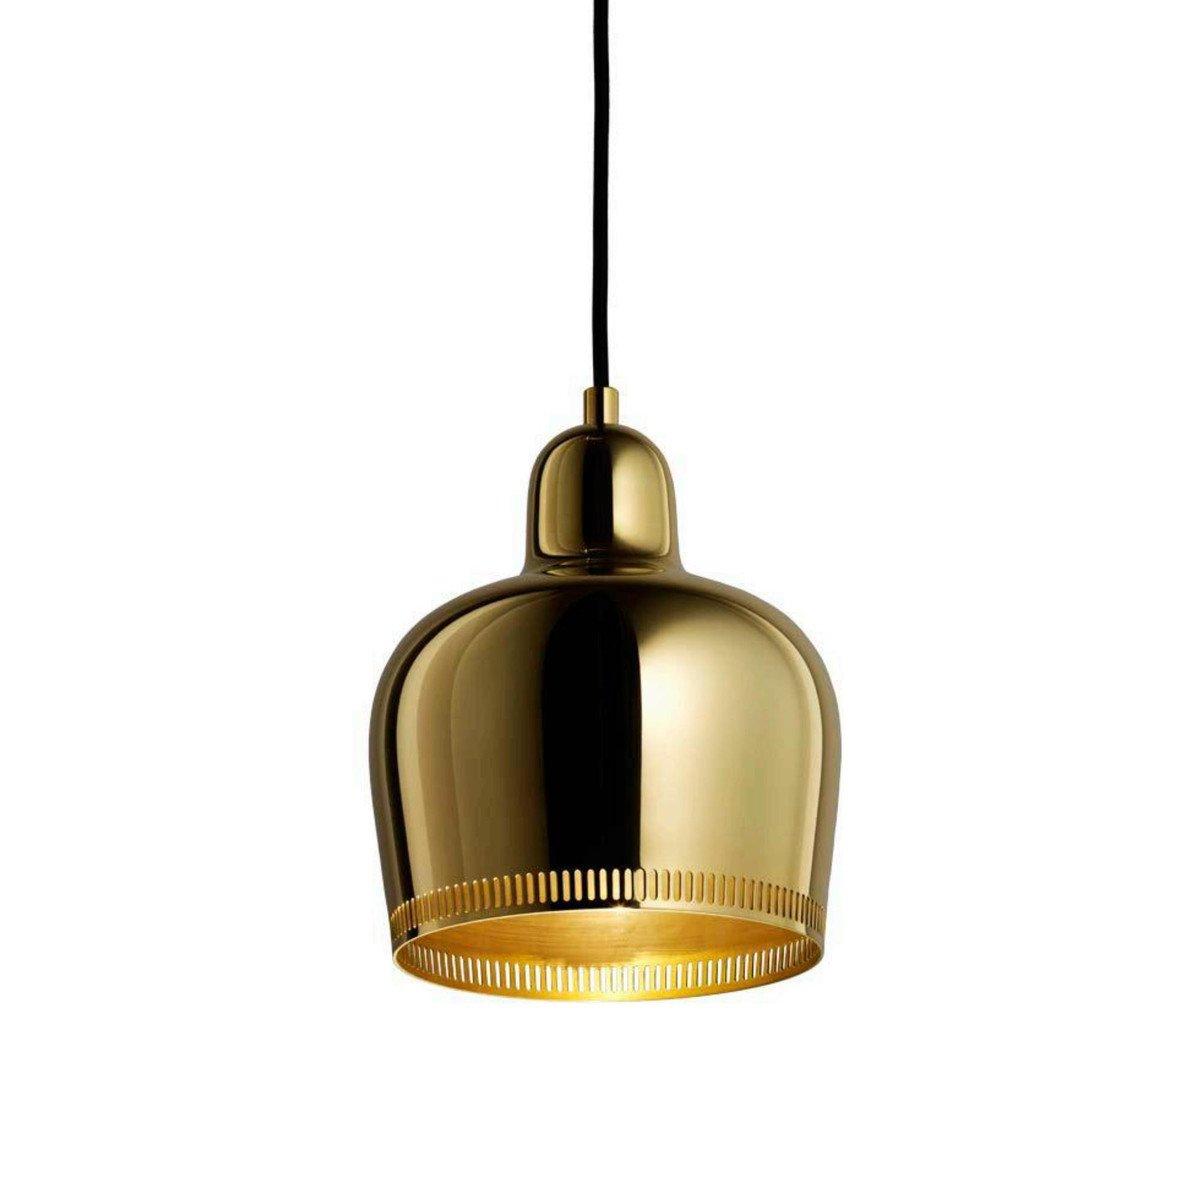 vitra lighting. Vitra - Golden Bell A330S Savoy Suspension Lamp Lighting L